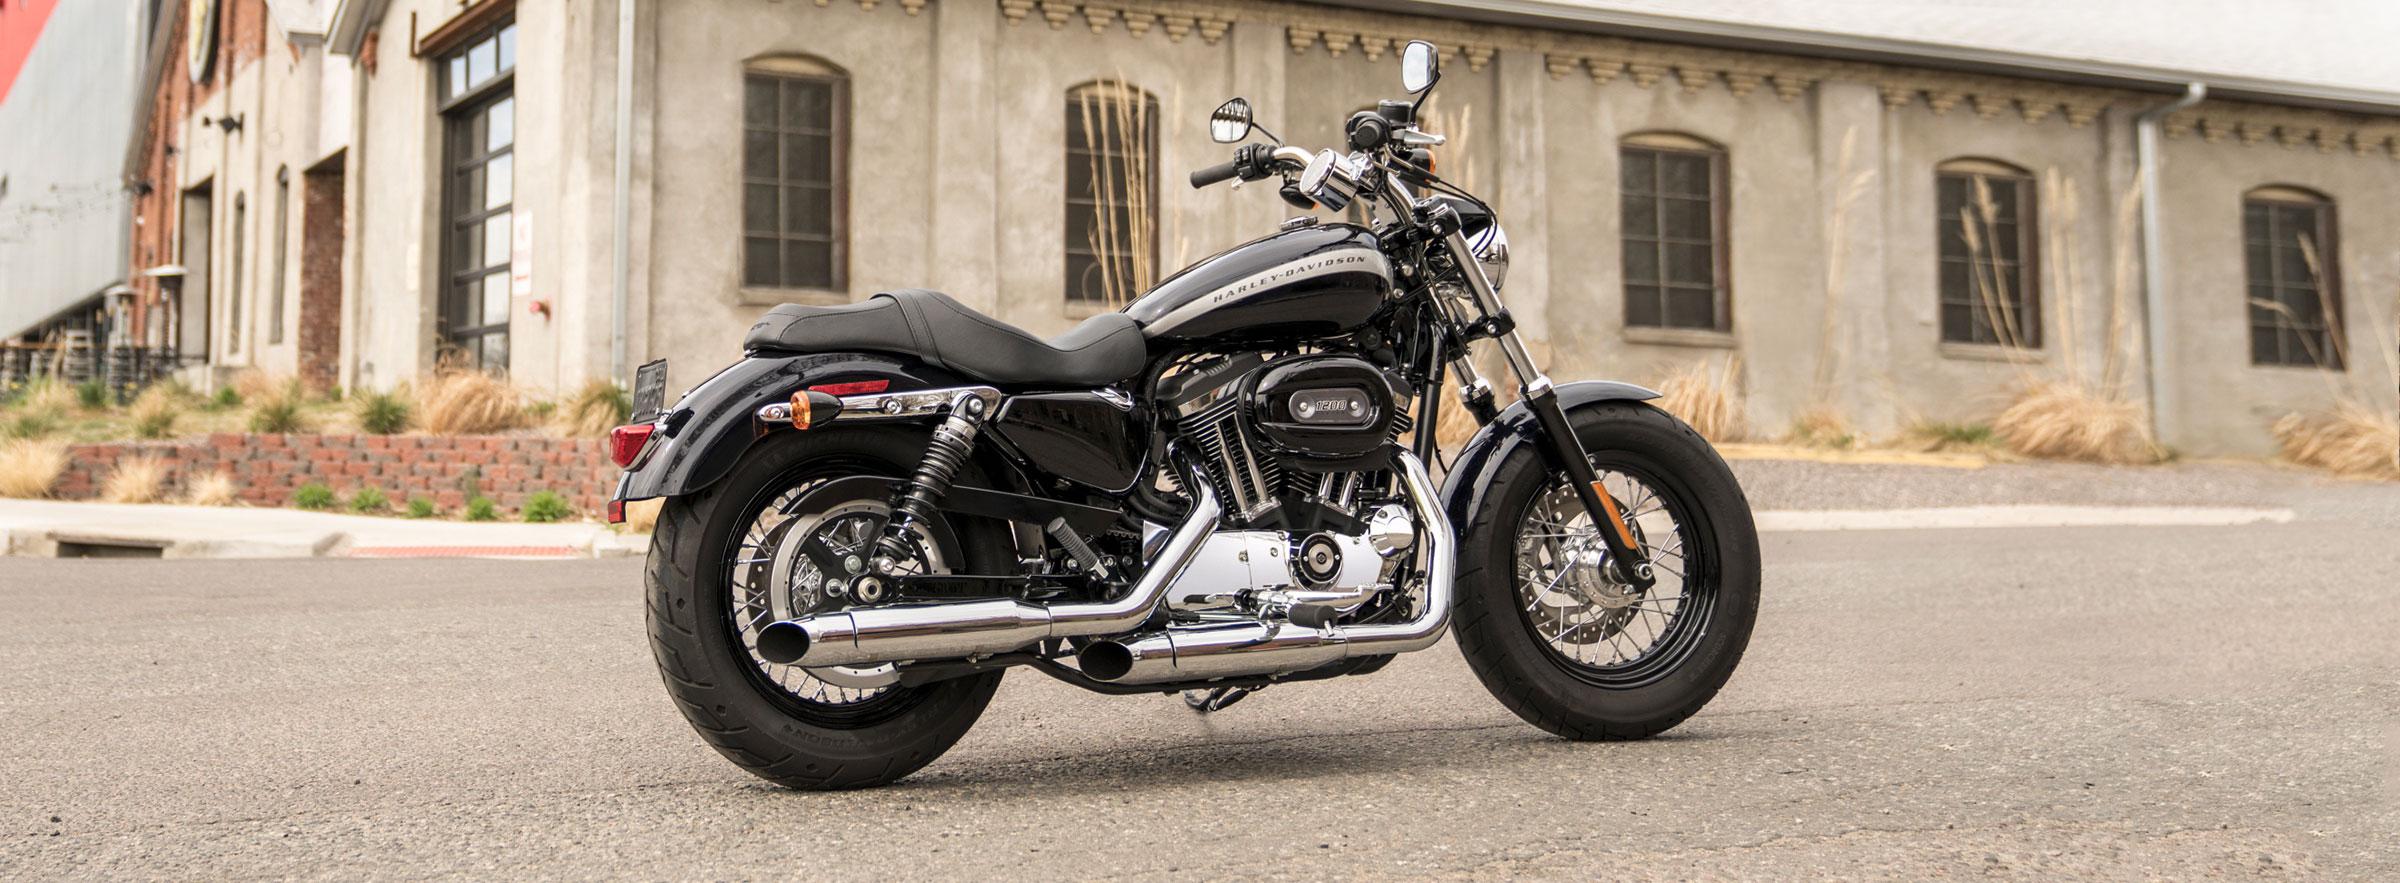 1200 custom 2019 motorcycles